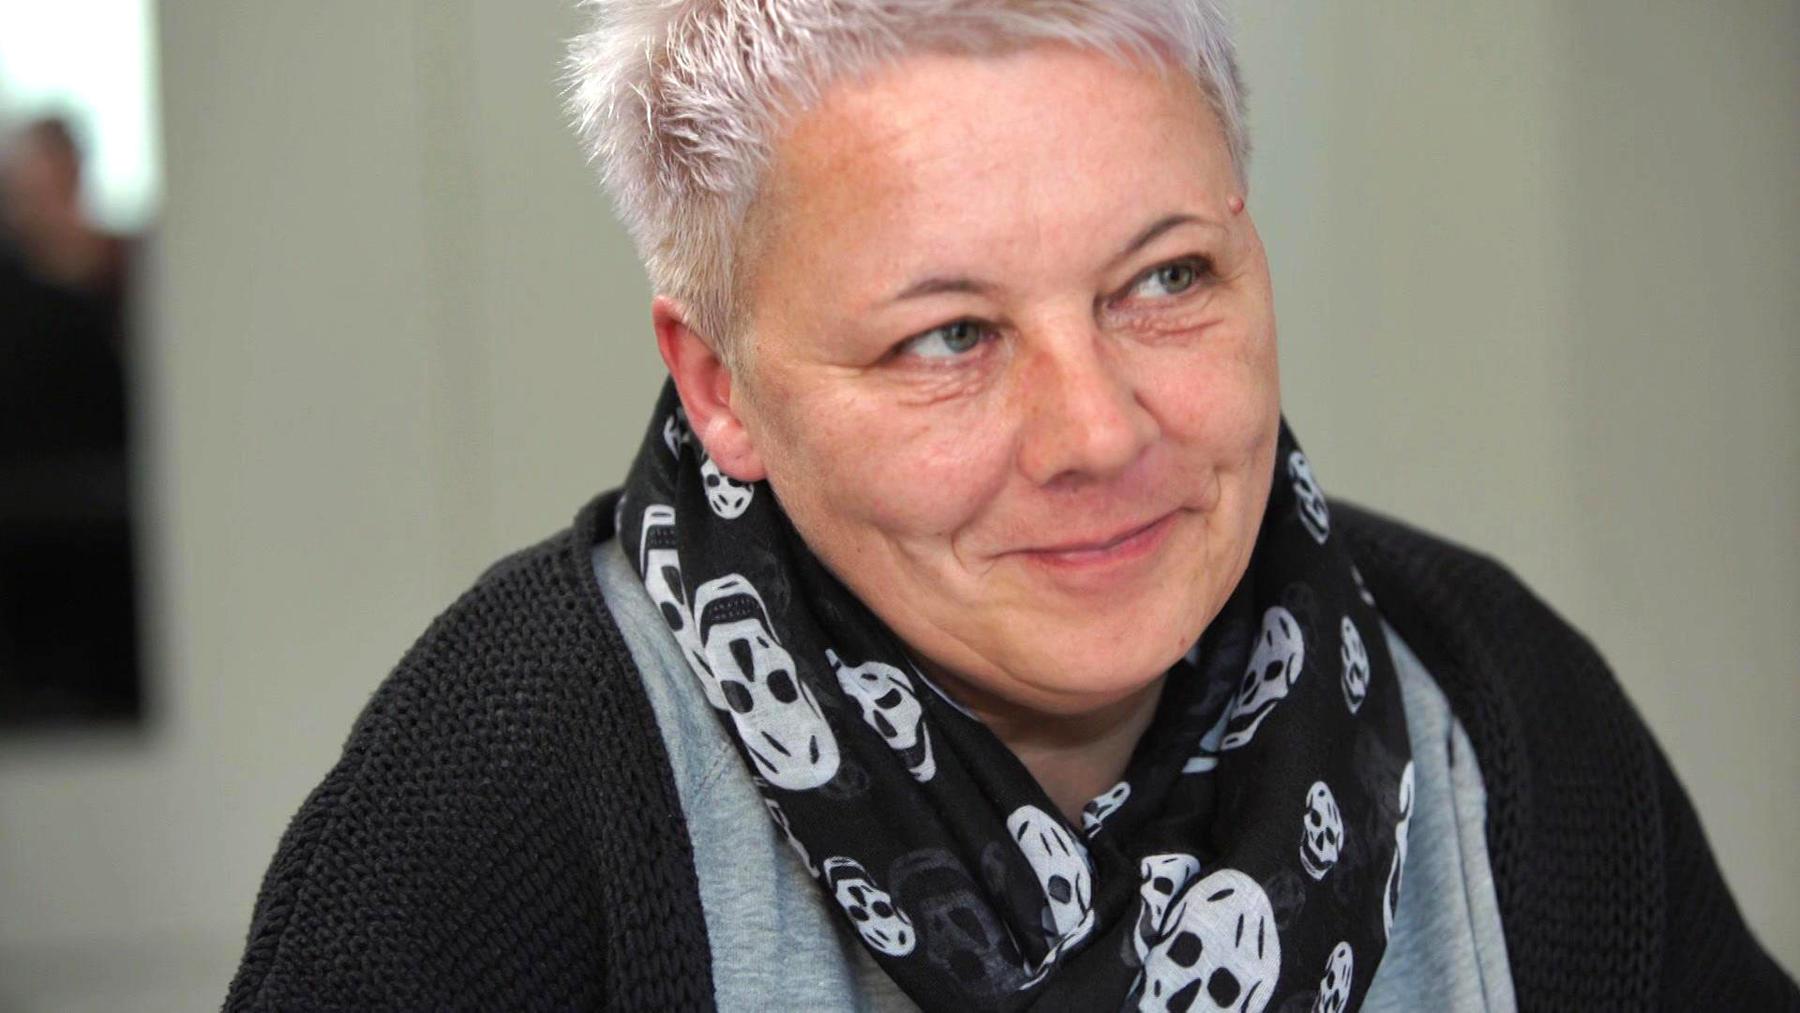 Corinna, Oberhausen - Warzenentfernung durch Lasermethode - Dr. Afschin Fatemi